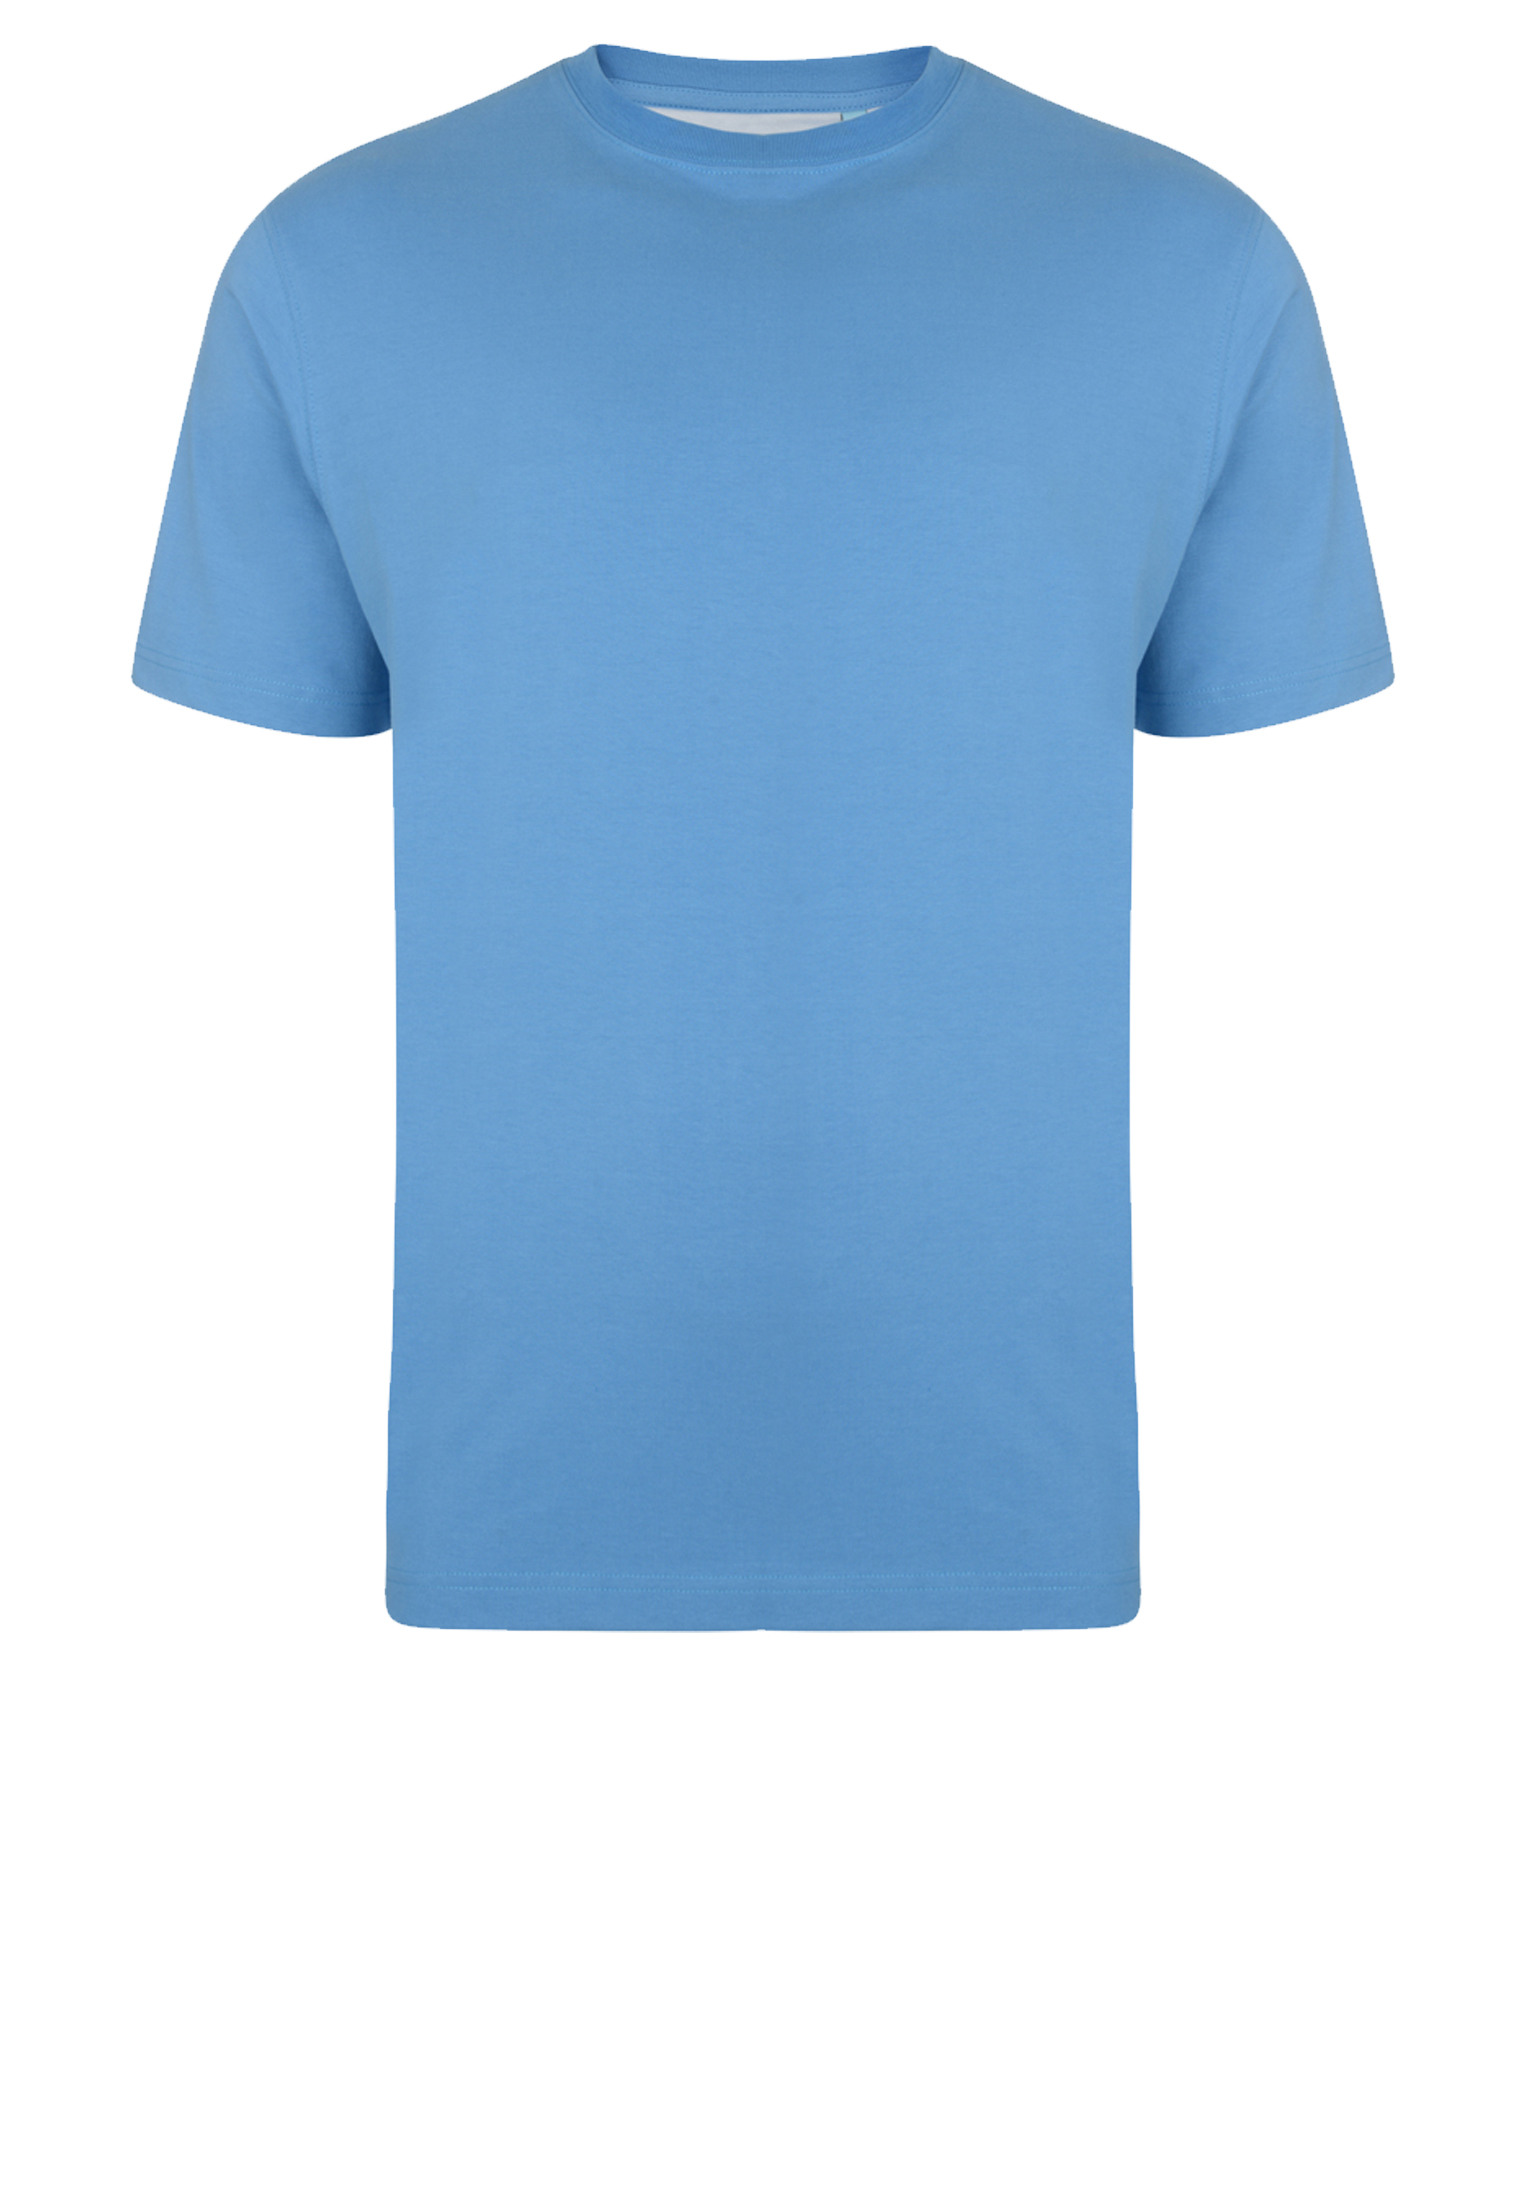 KAM JEANSWEAR effen kleur t-shirt met ronde hals in de kleur licht blauw.